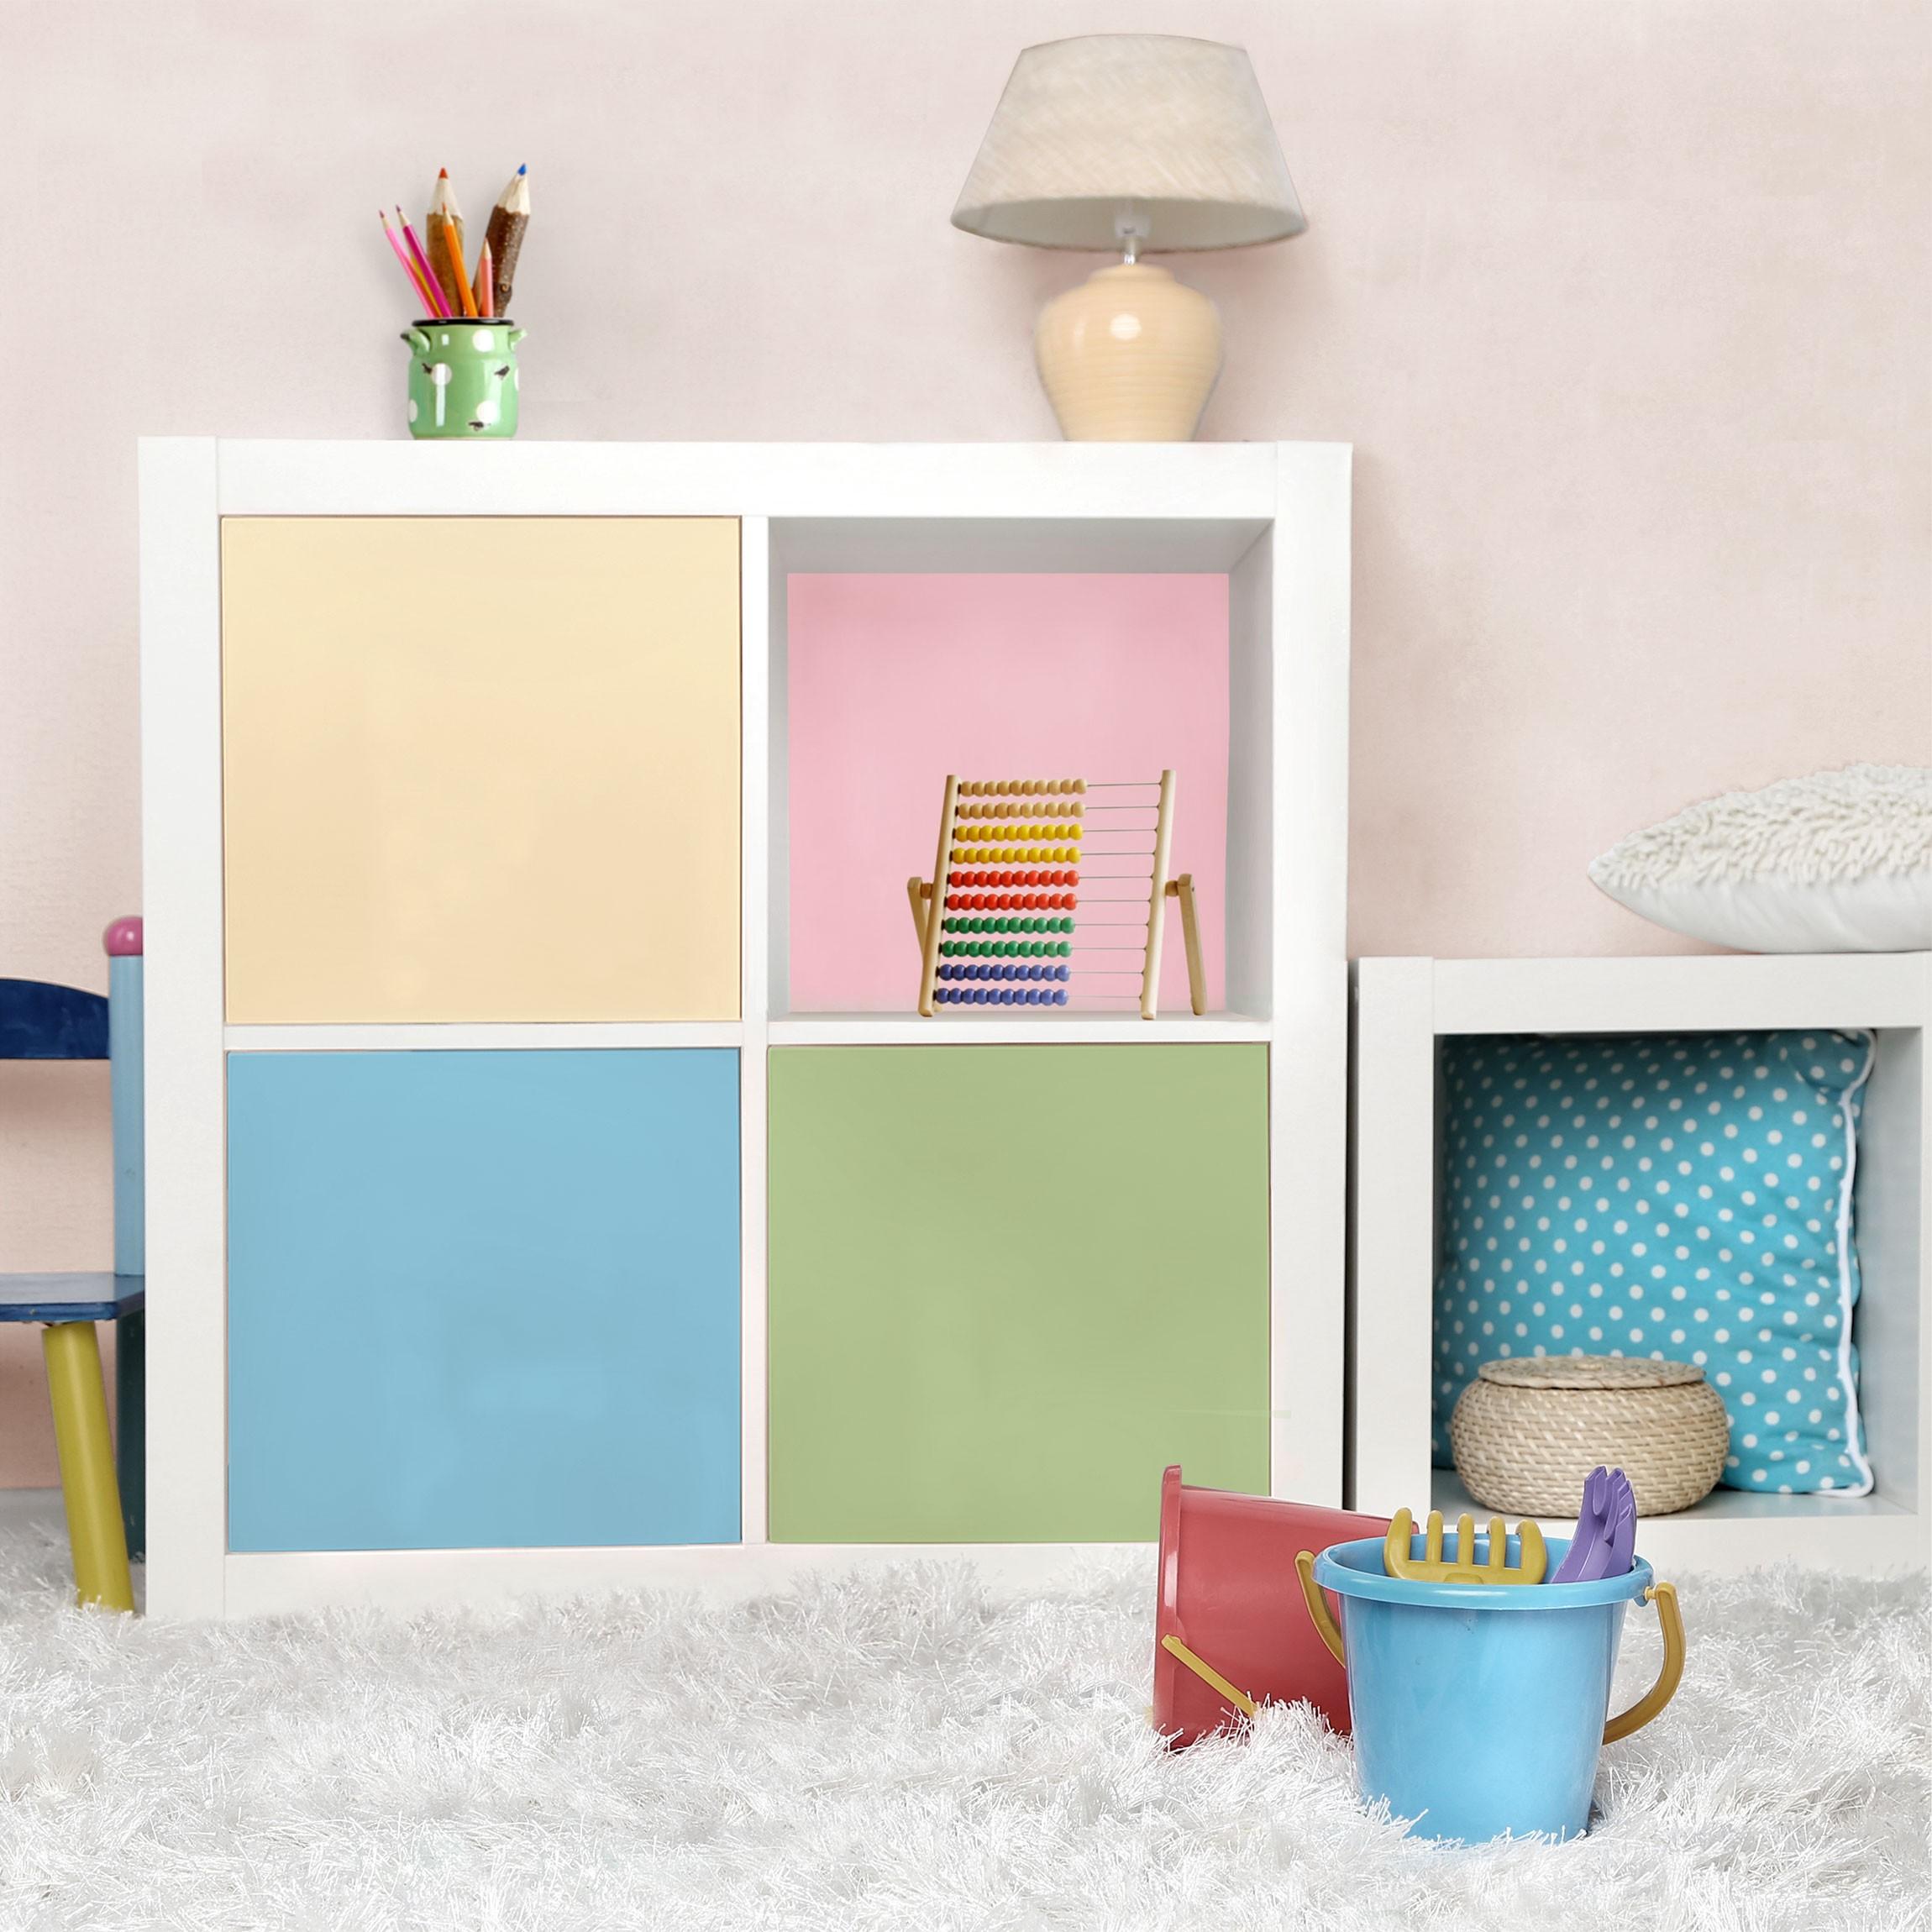 klebefolie kinderzimmer set mit 4 sch nen pastellfarben cr me ros pastellblau mint. Black Bedroom Furniture Sets. Home Design Ideas